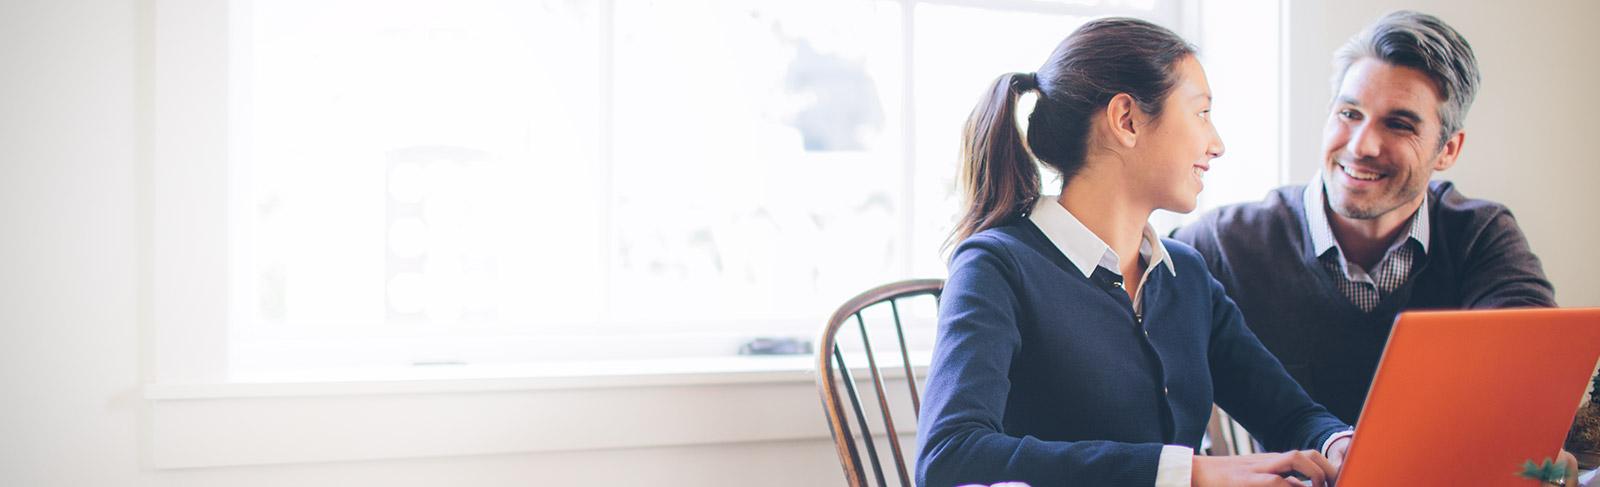 Conheça o Microsoft Office Home & Student 2016